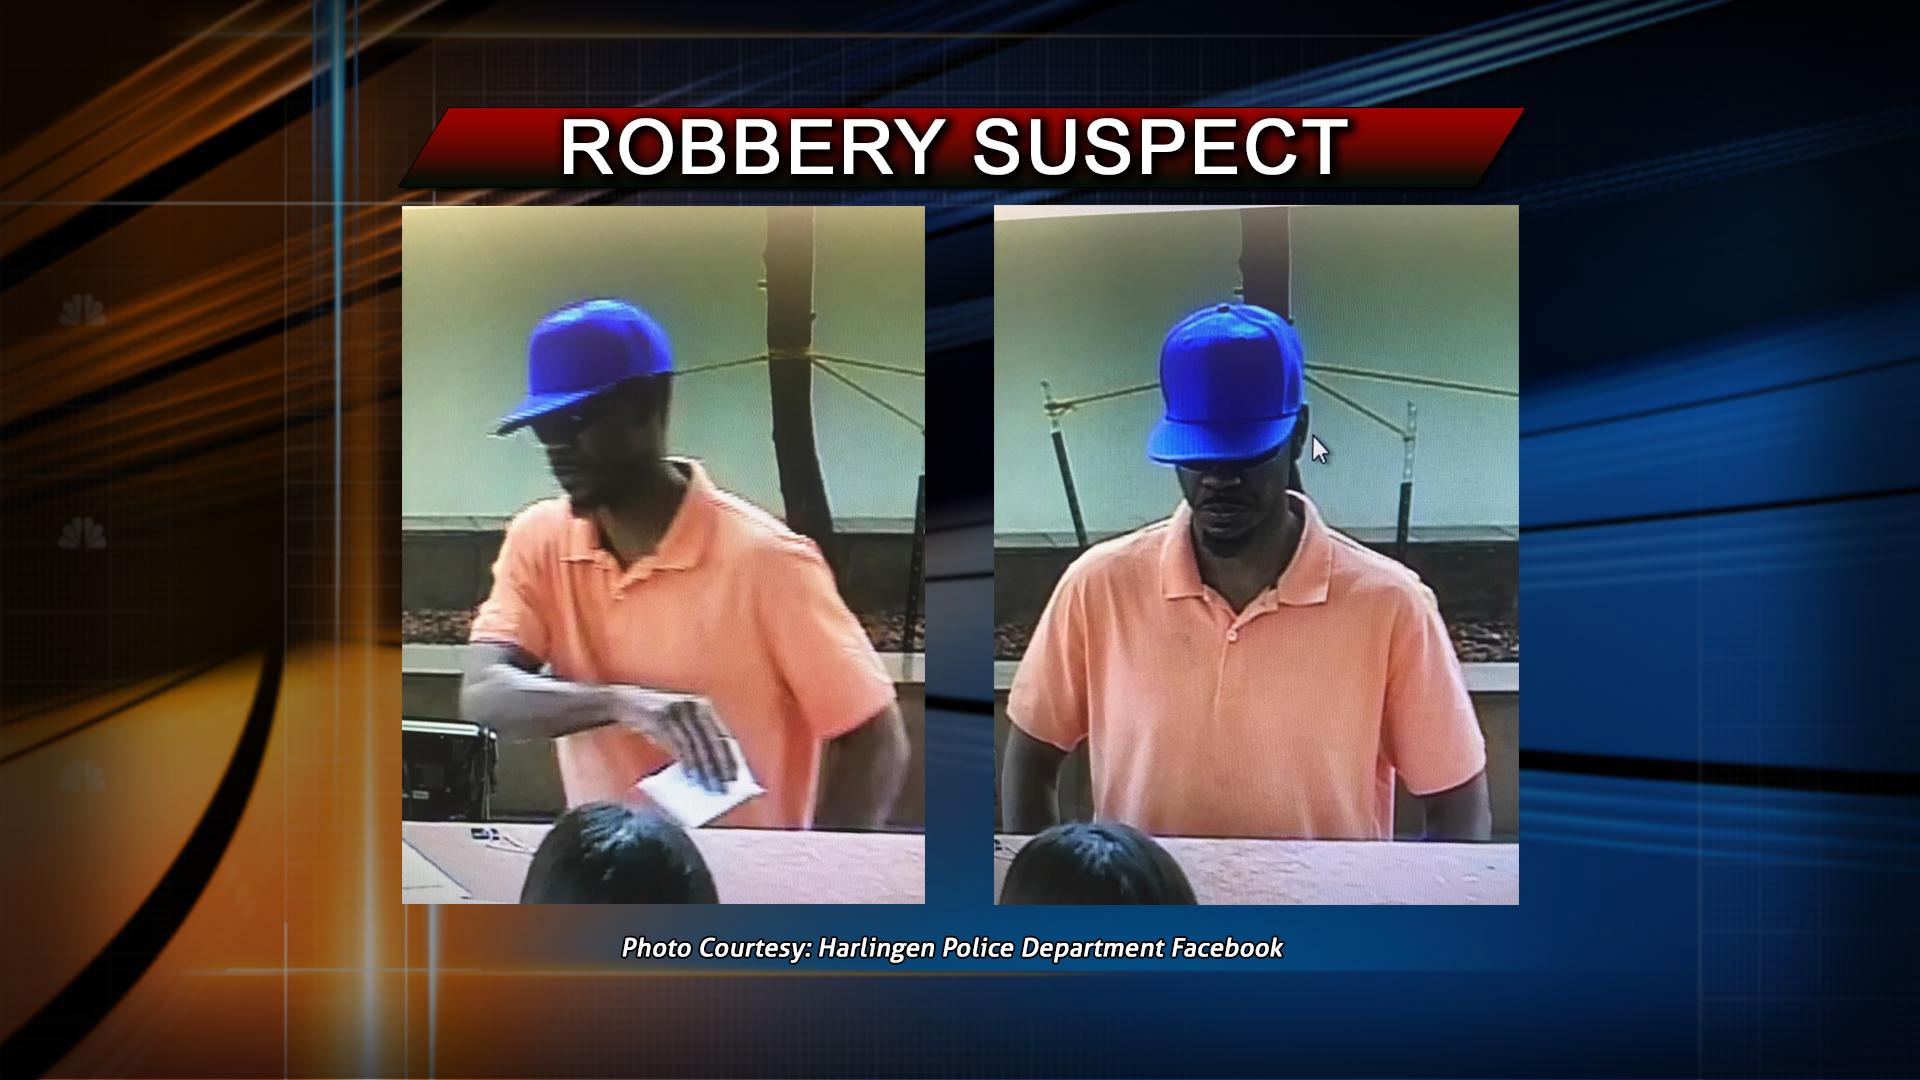 RobberySuspect_1495832592783.jpg